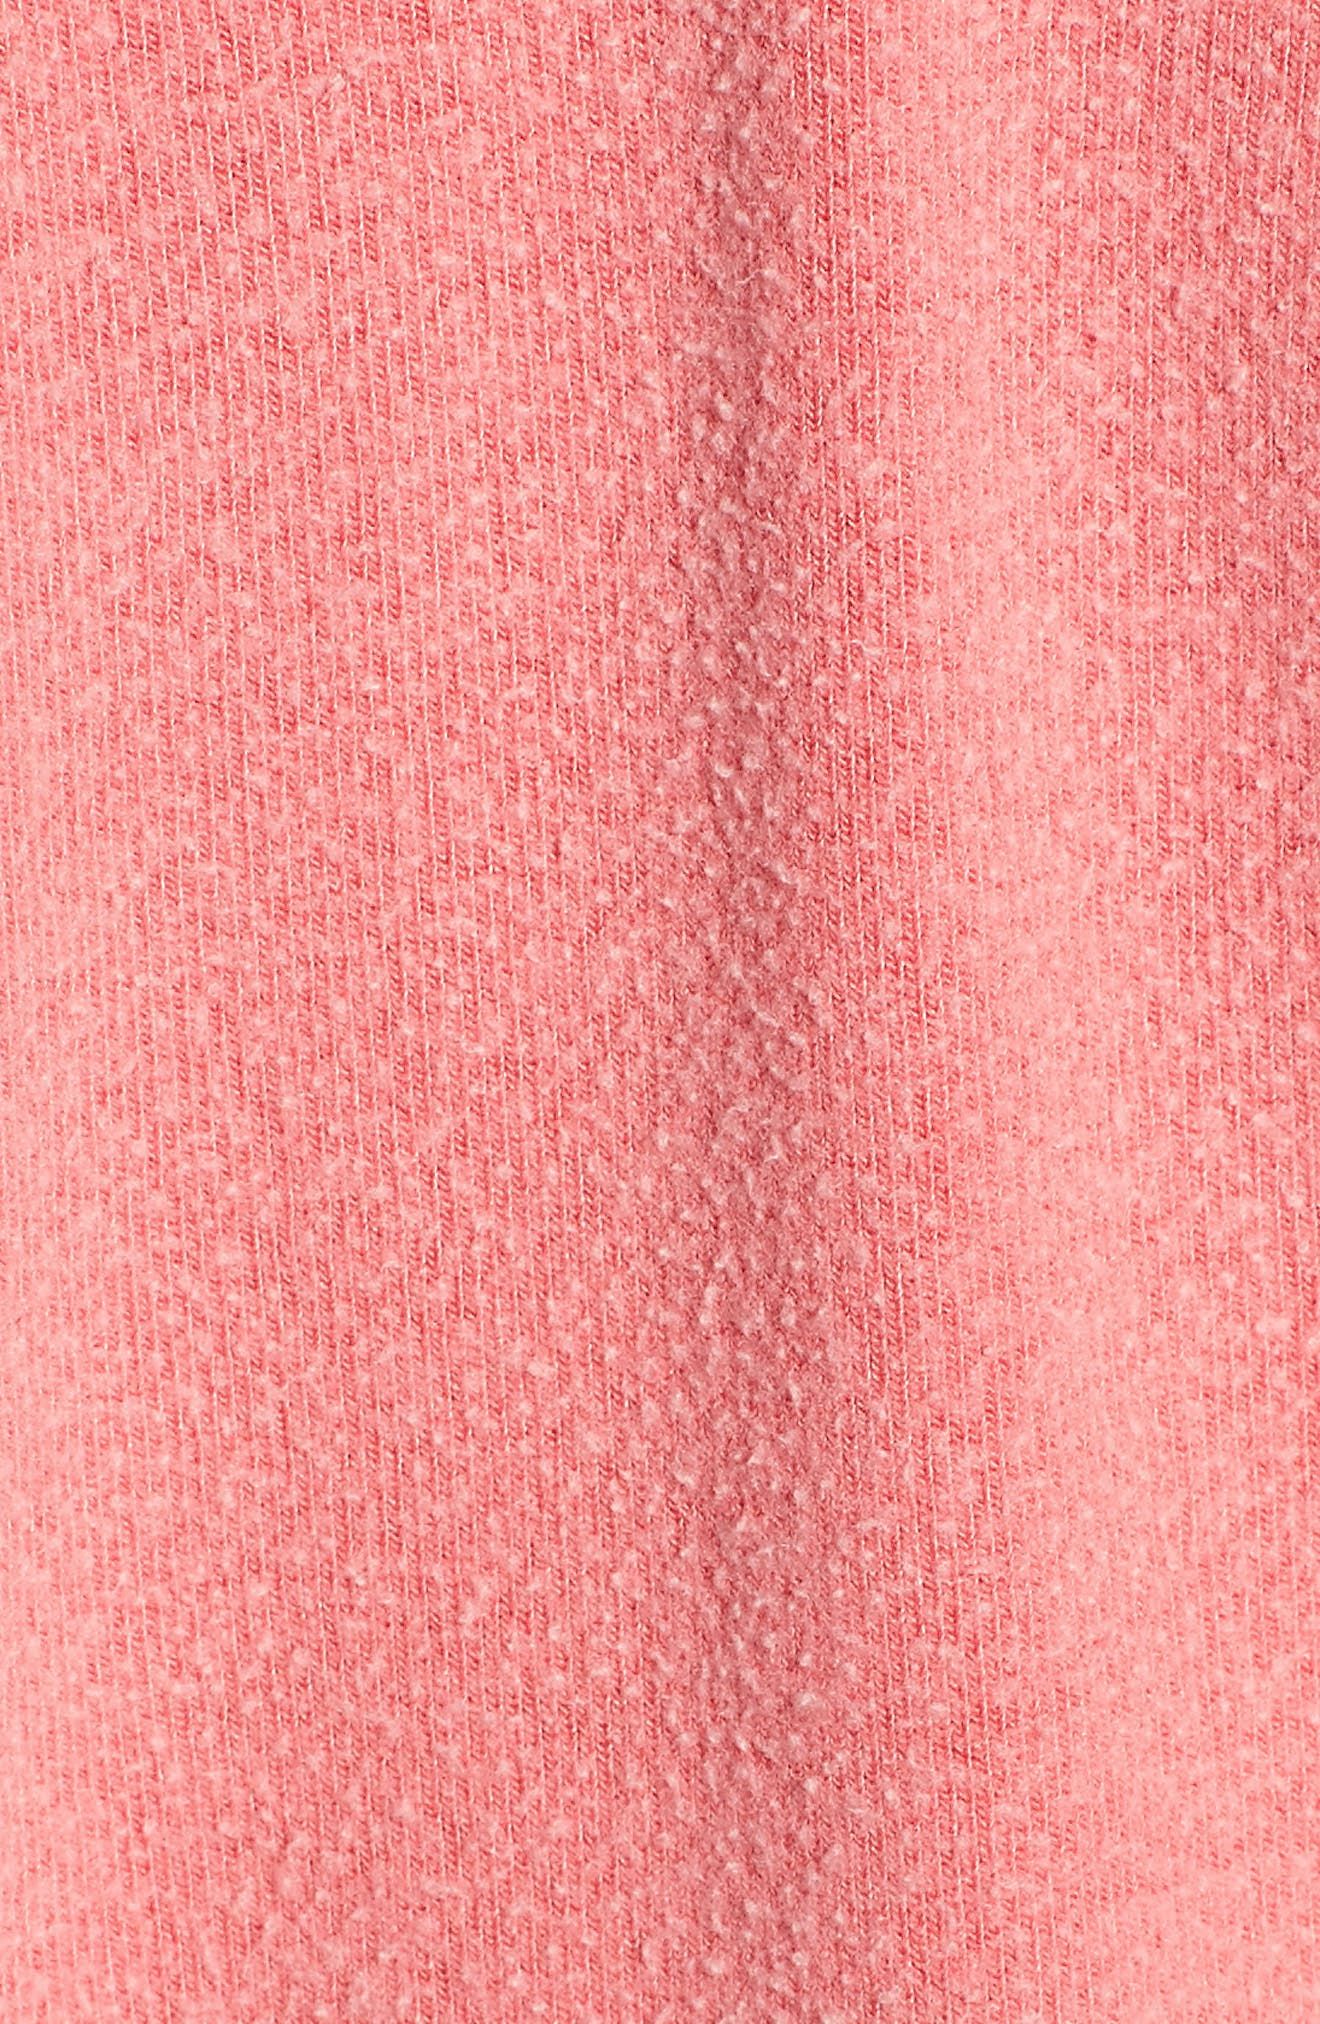 Caliente Junior Sweatshirt,                             Alternate thumbnail 5, color,                             Pigment Hot Lipstick